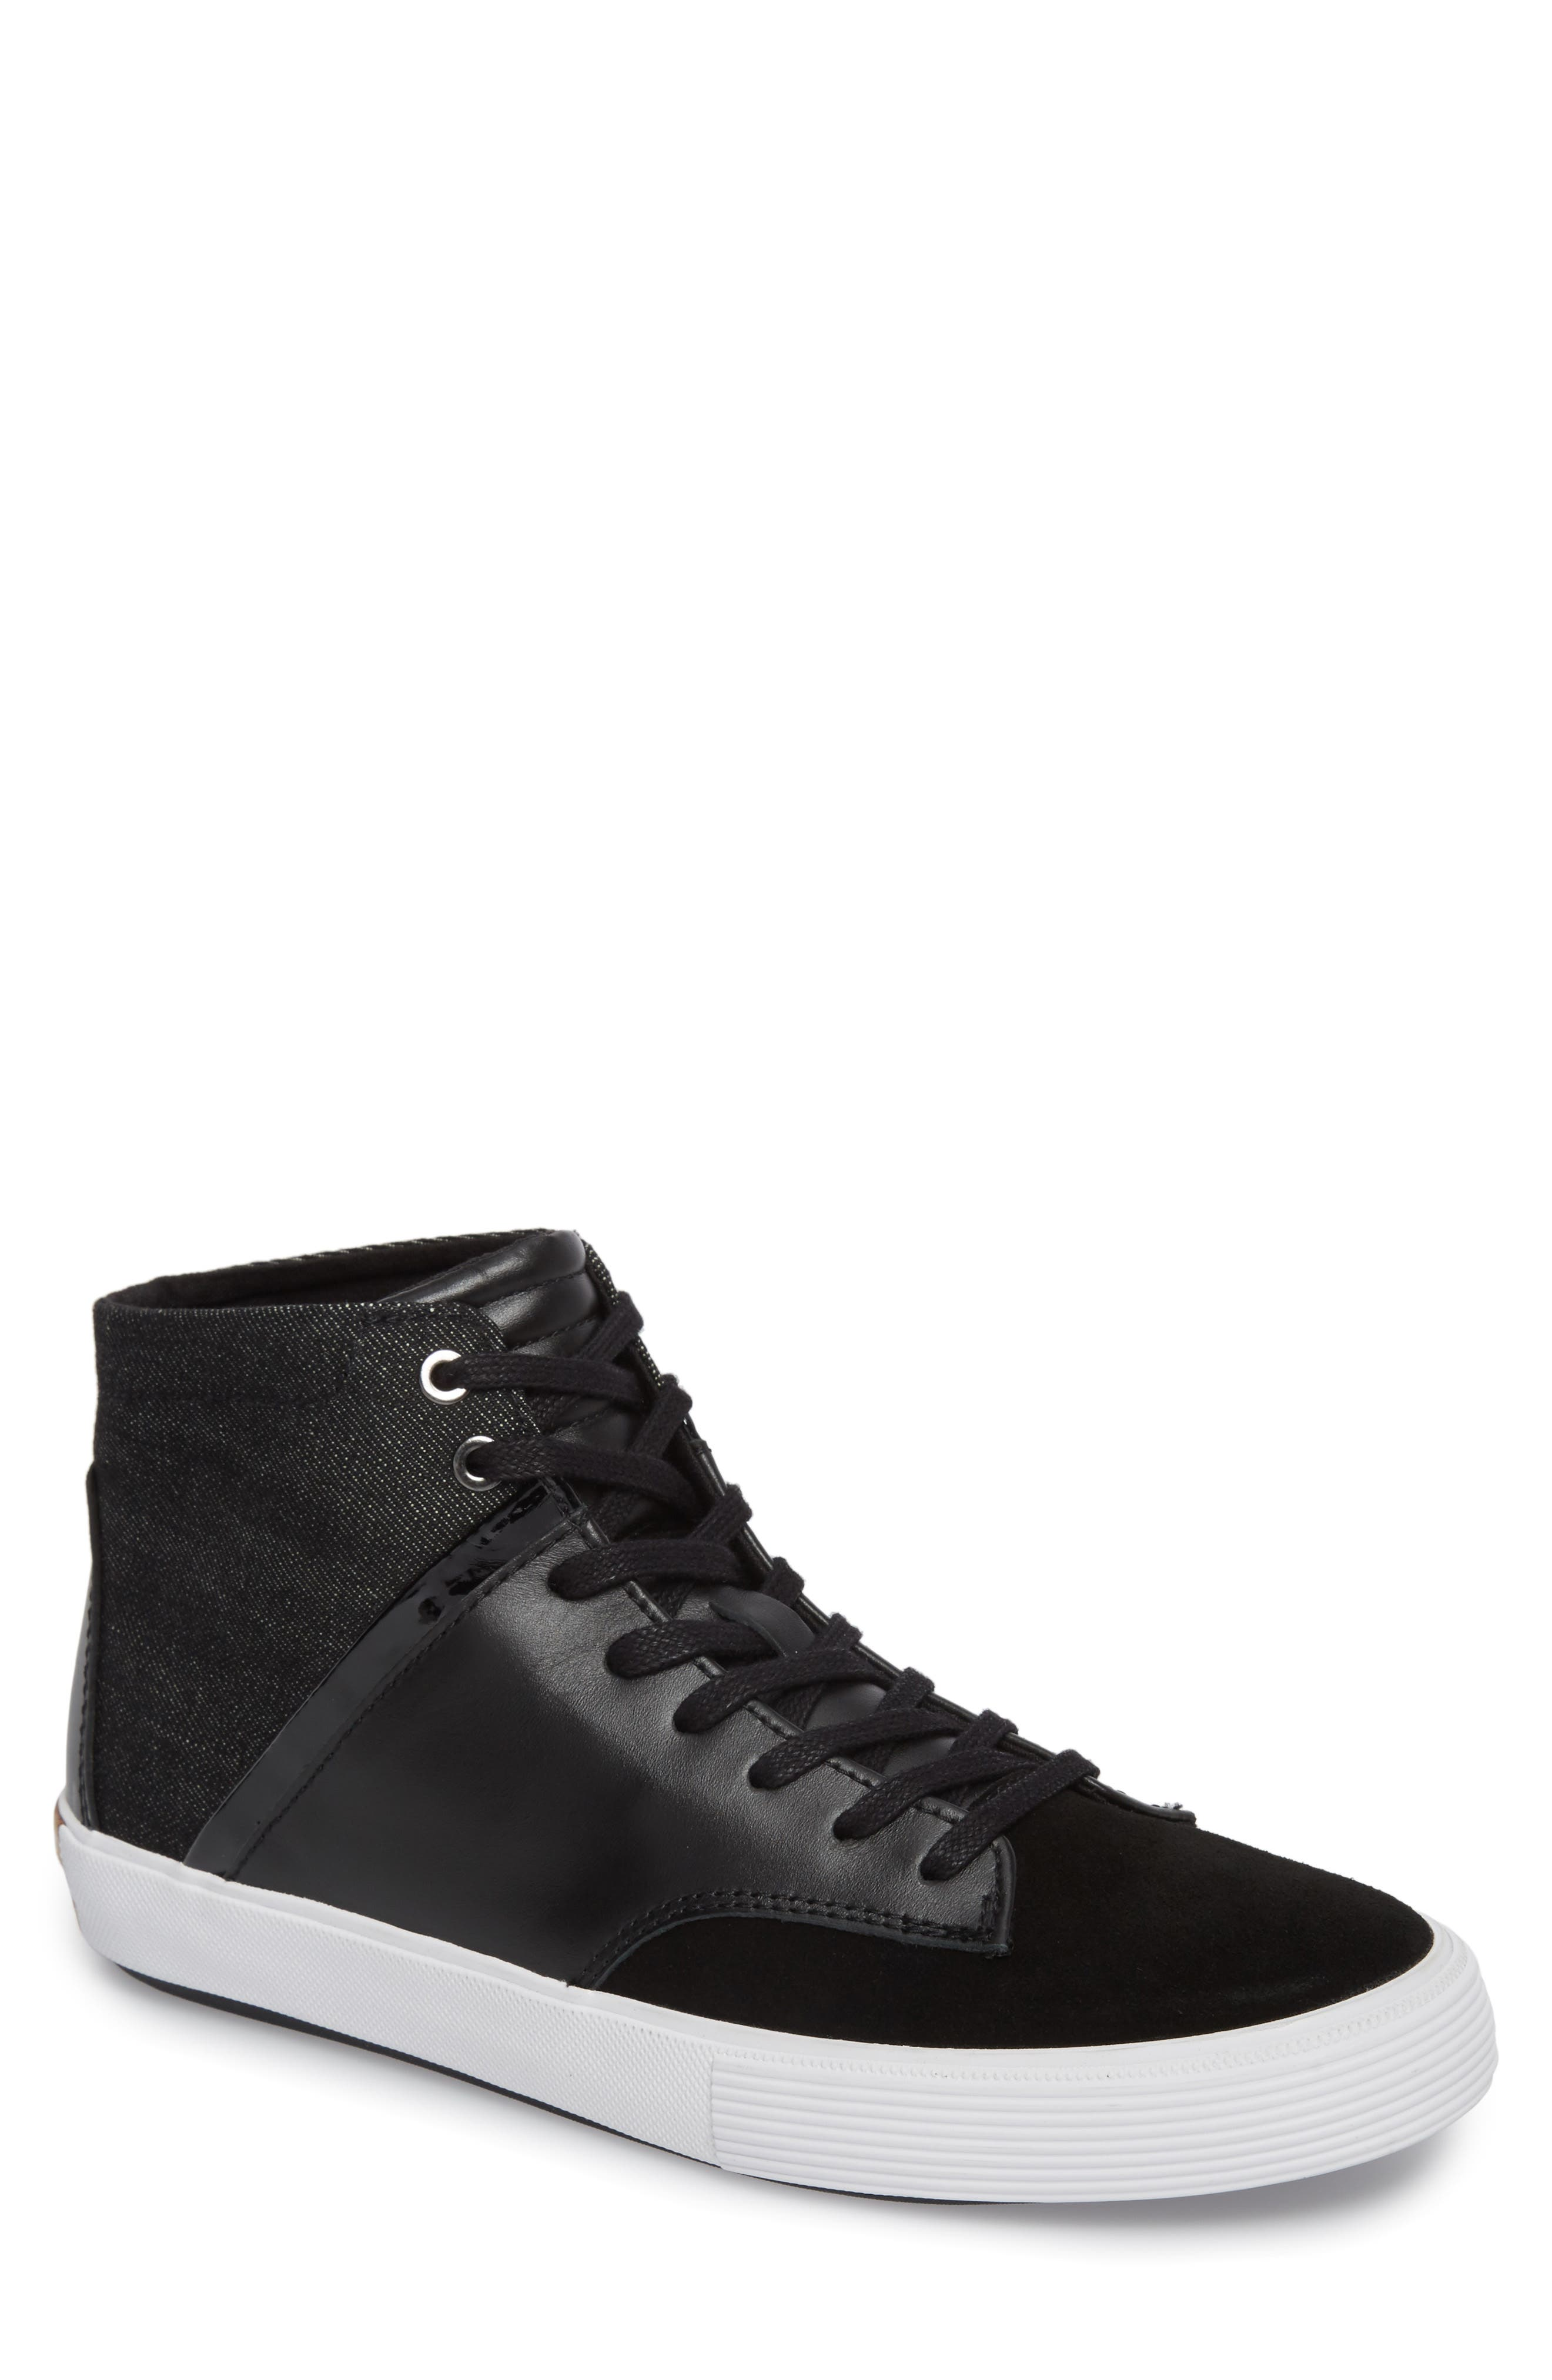 Joe's Joe Mac High Top Sneaker (Men)